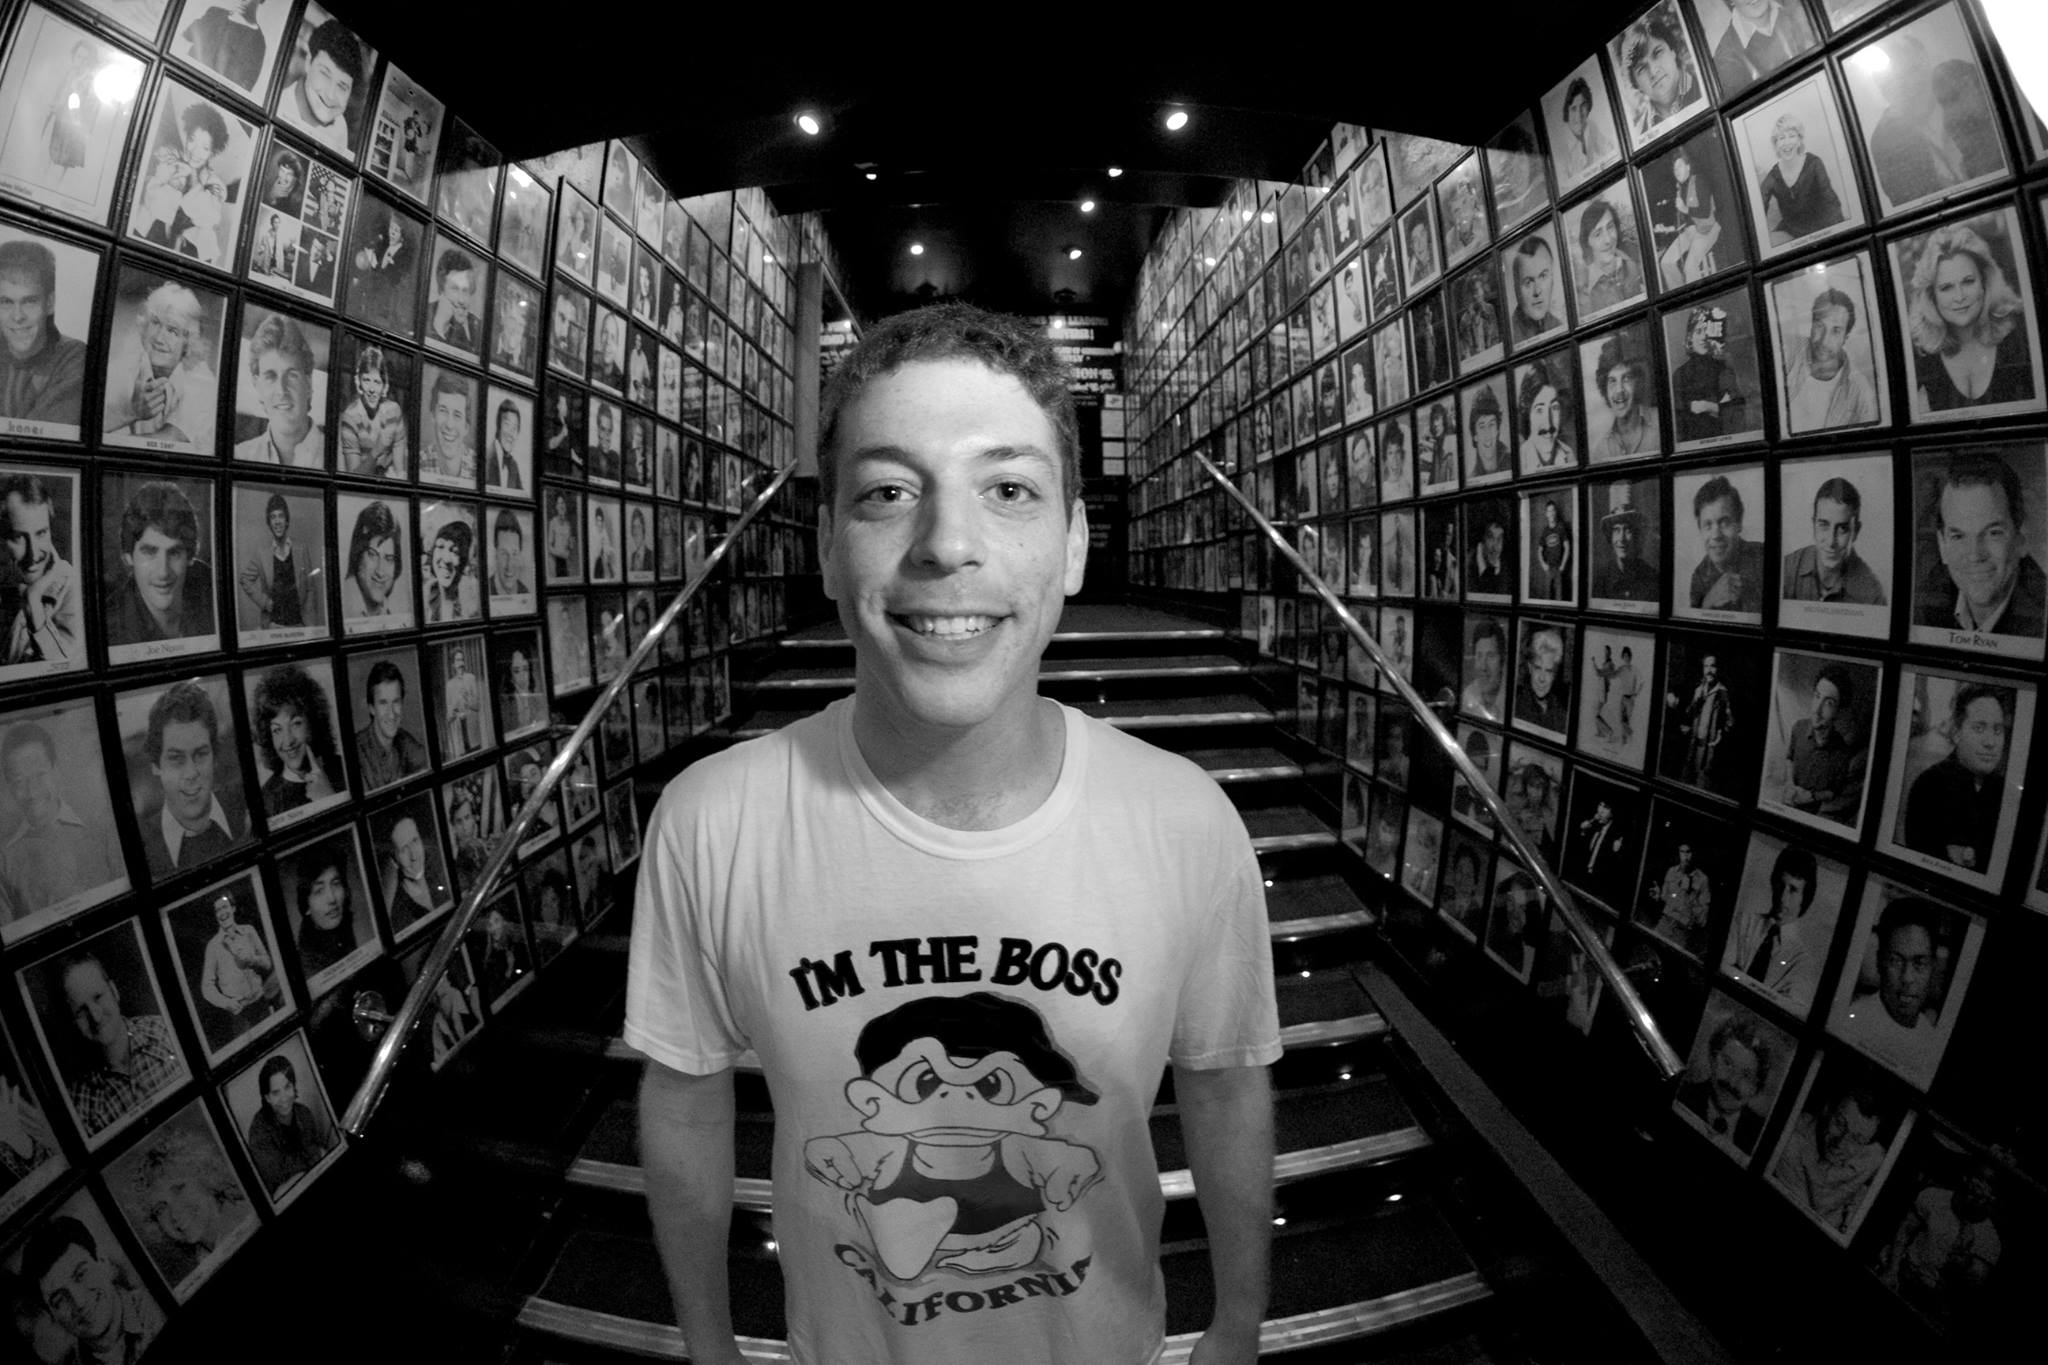 Jeffrey Baldinger Comedy Store Fish Bowl smile.jpg